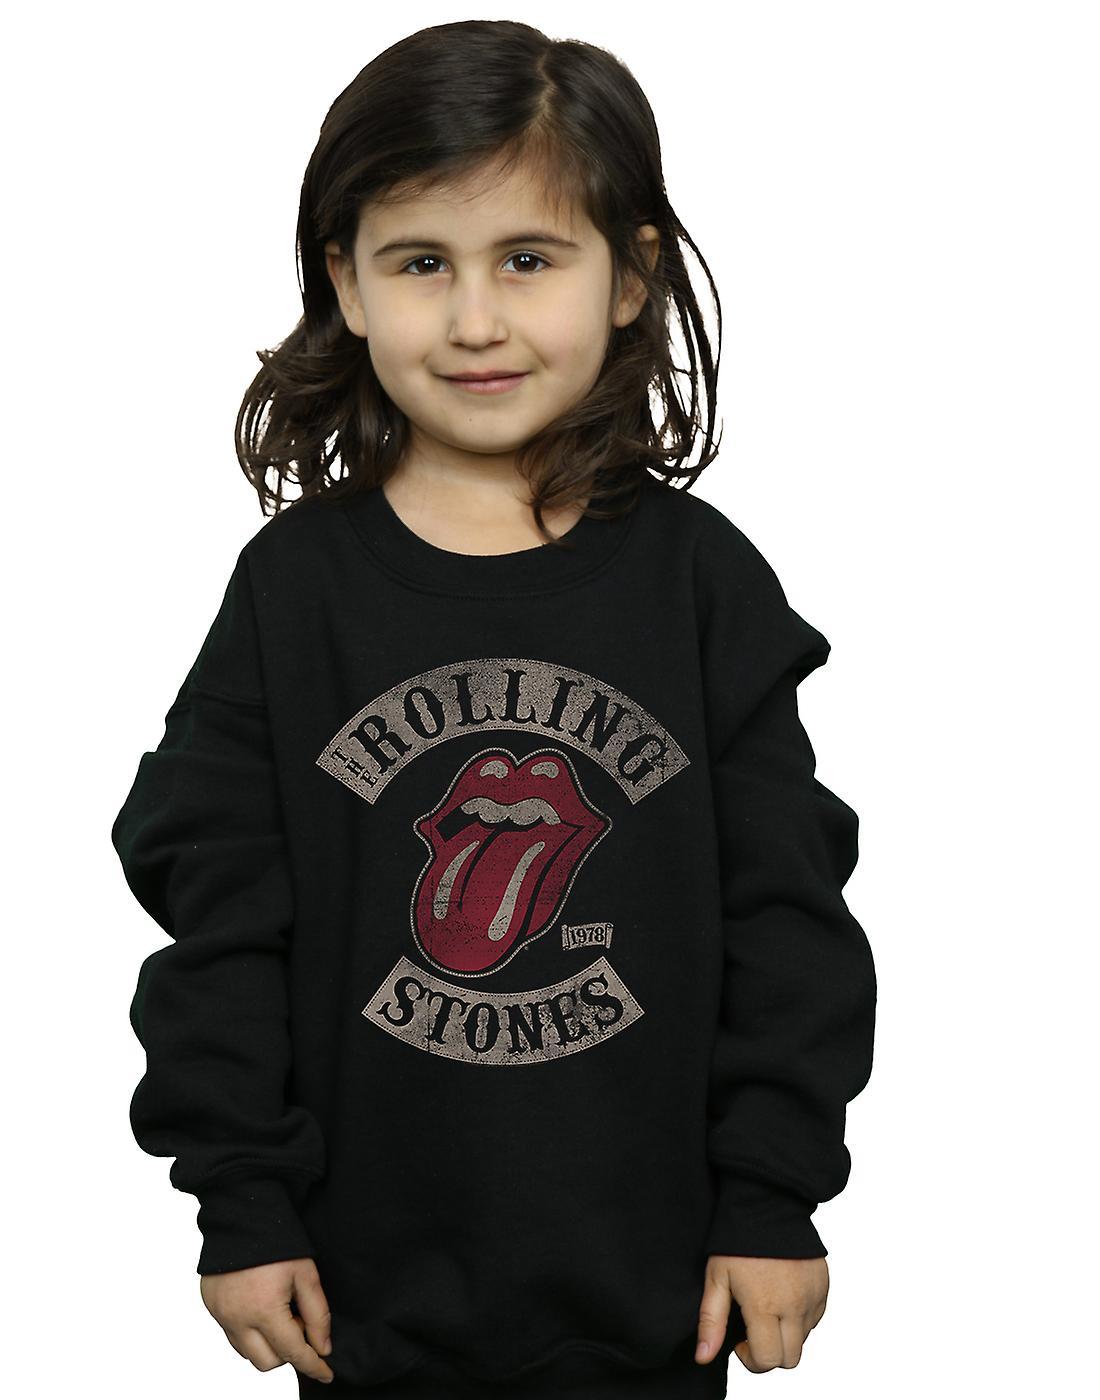 Rolling Stones Girls Tour 78 Sweatshirt